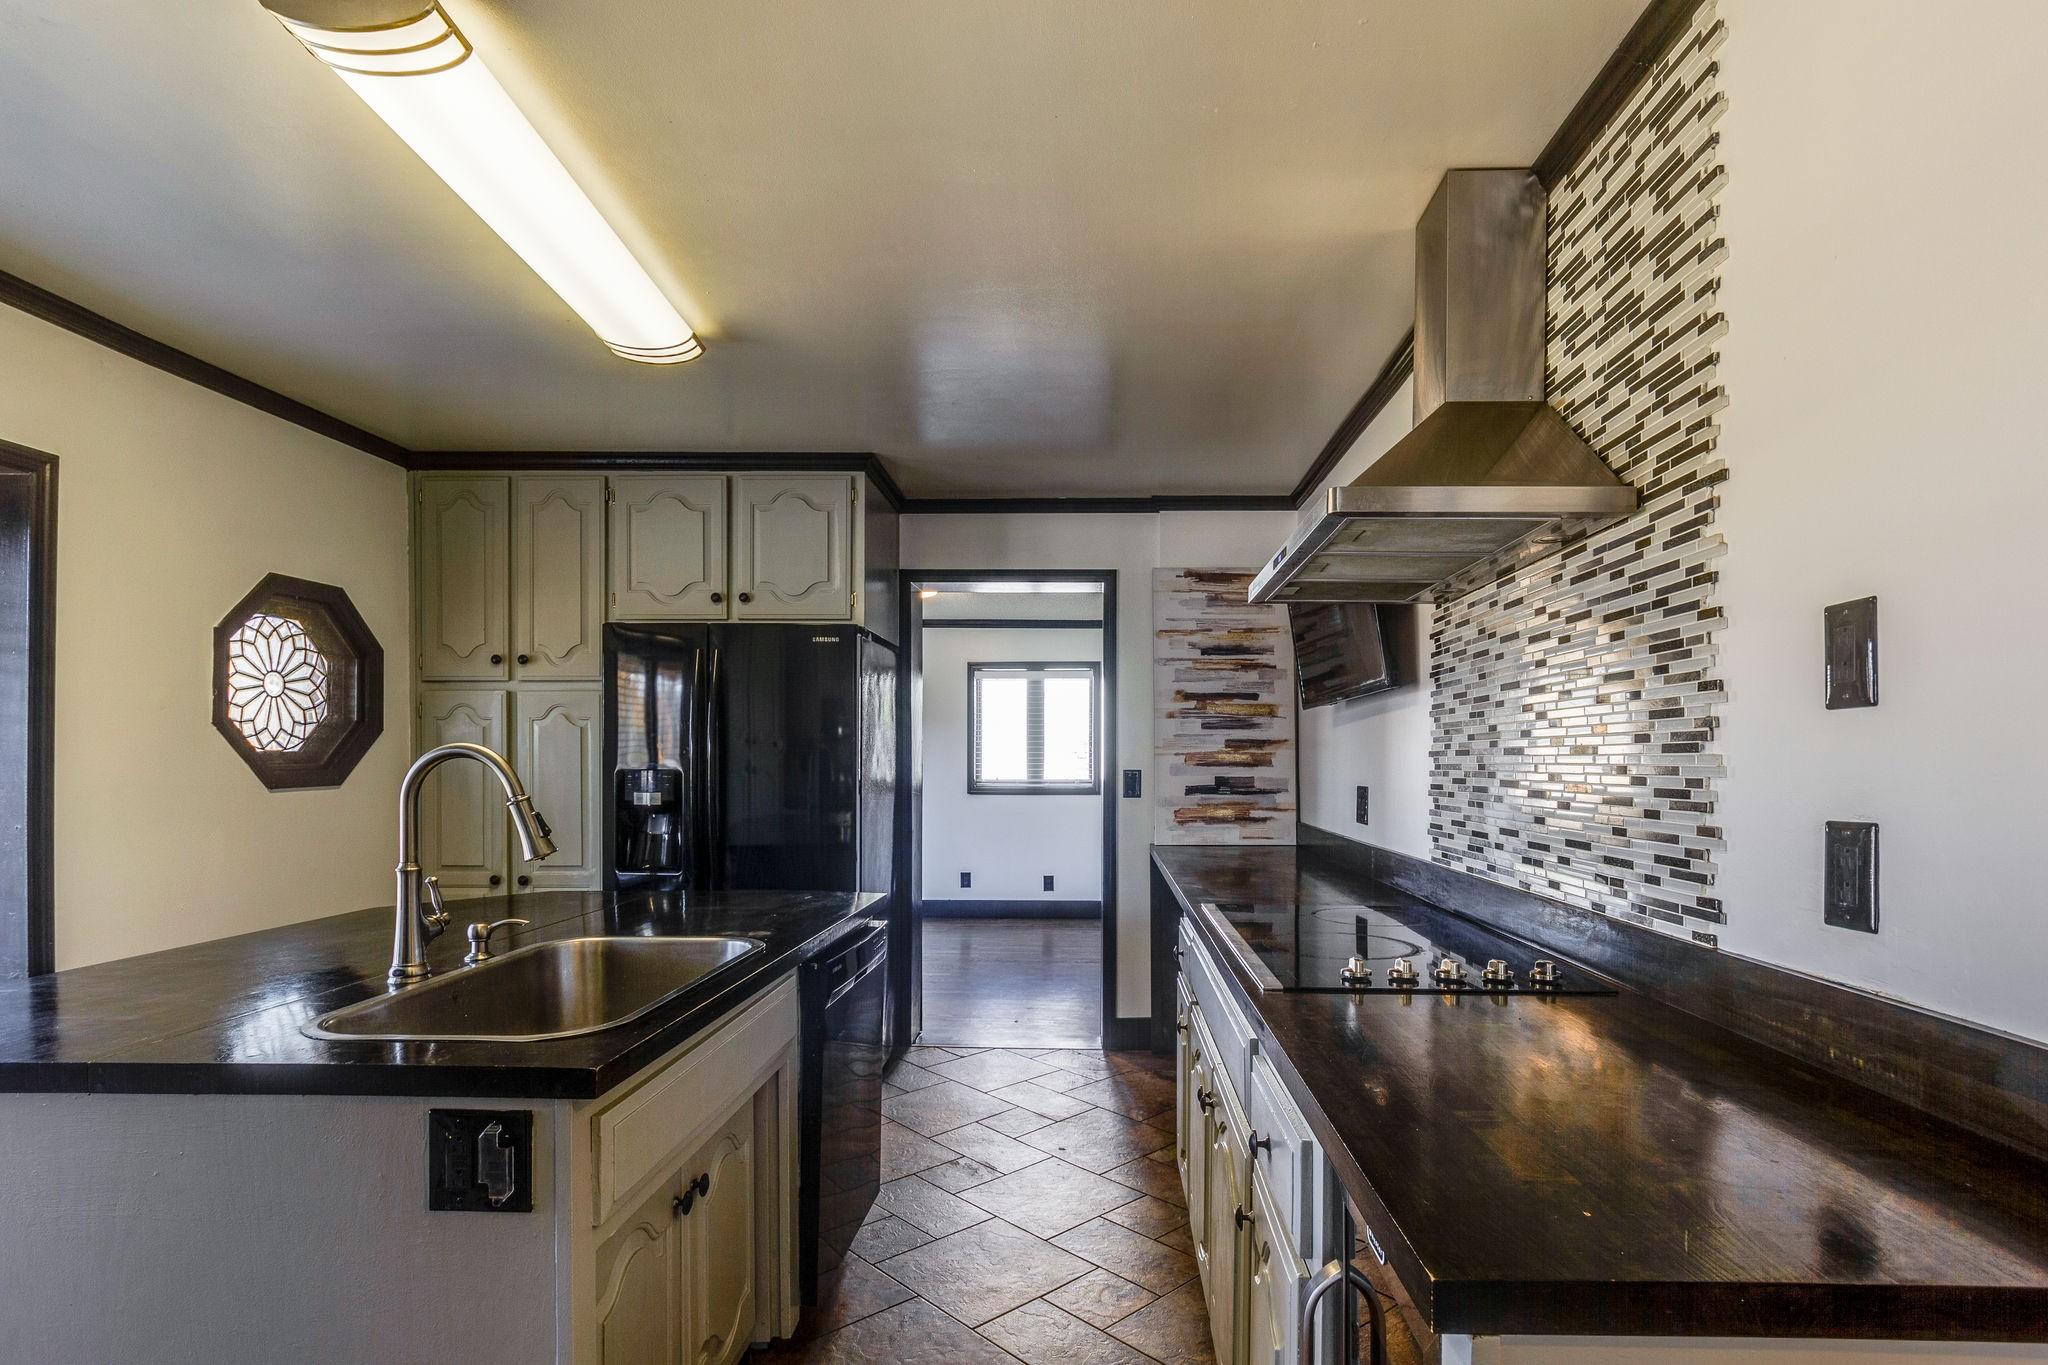 205 Blanchard Pl, Nashville, TN 37214 - Nashville, TN real estate listing